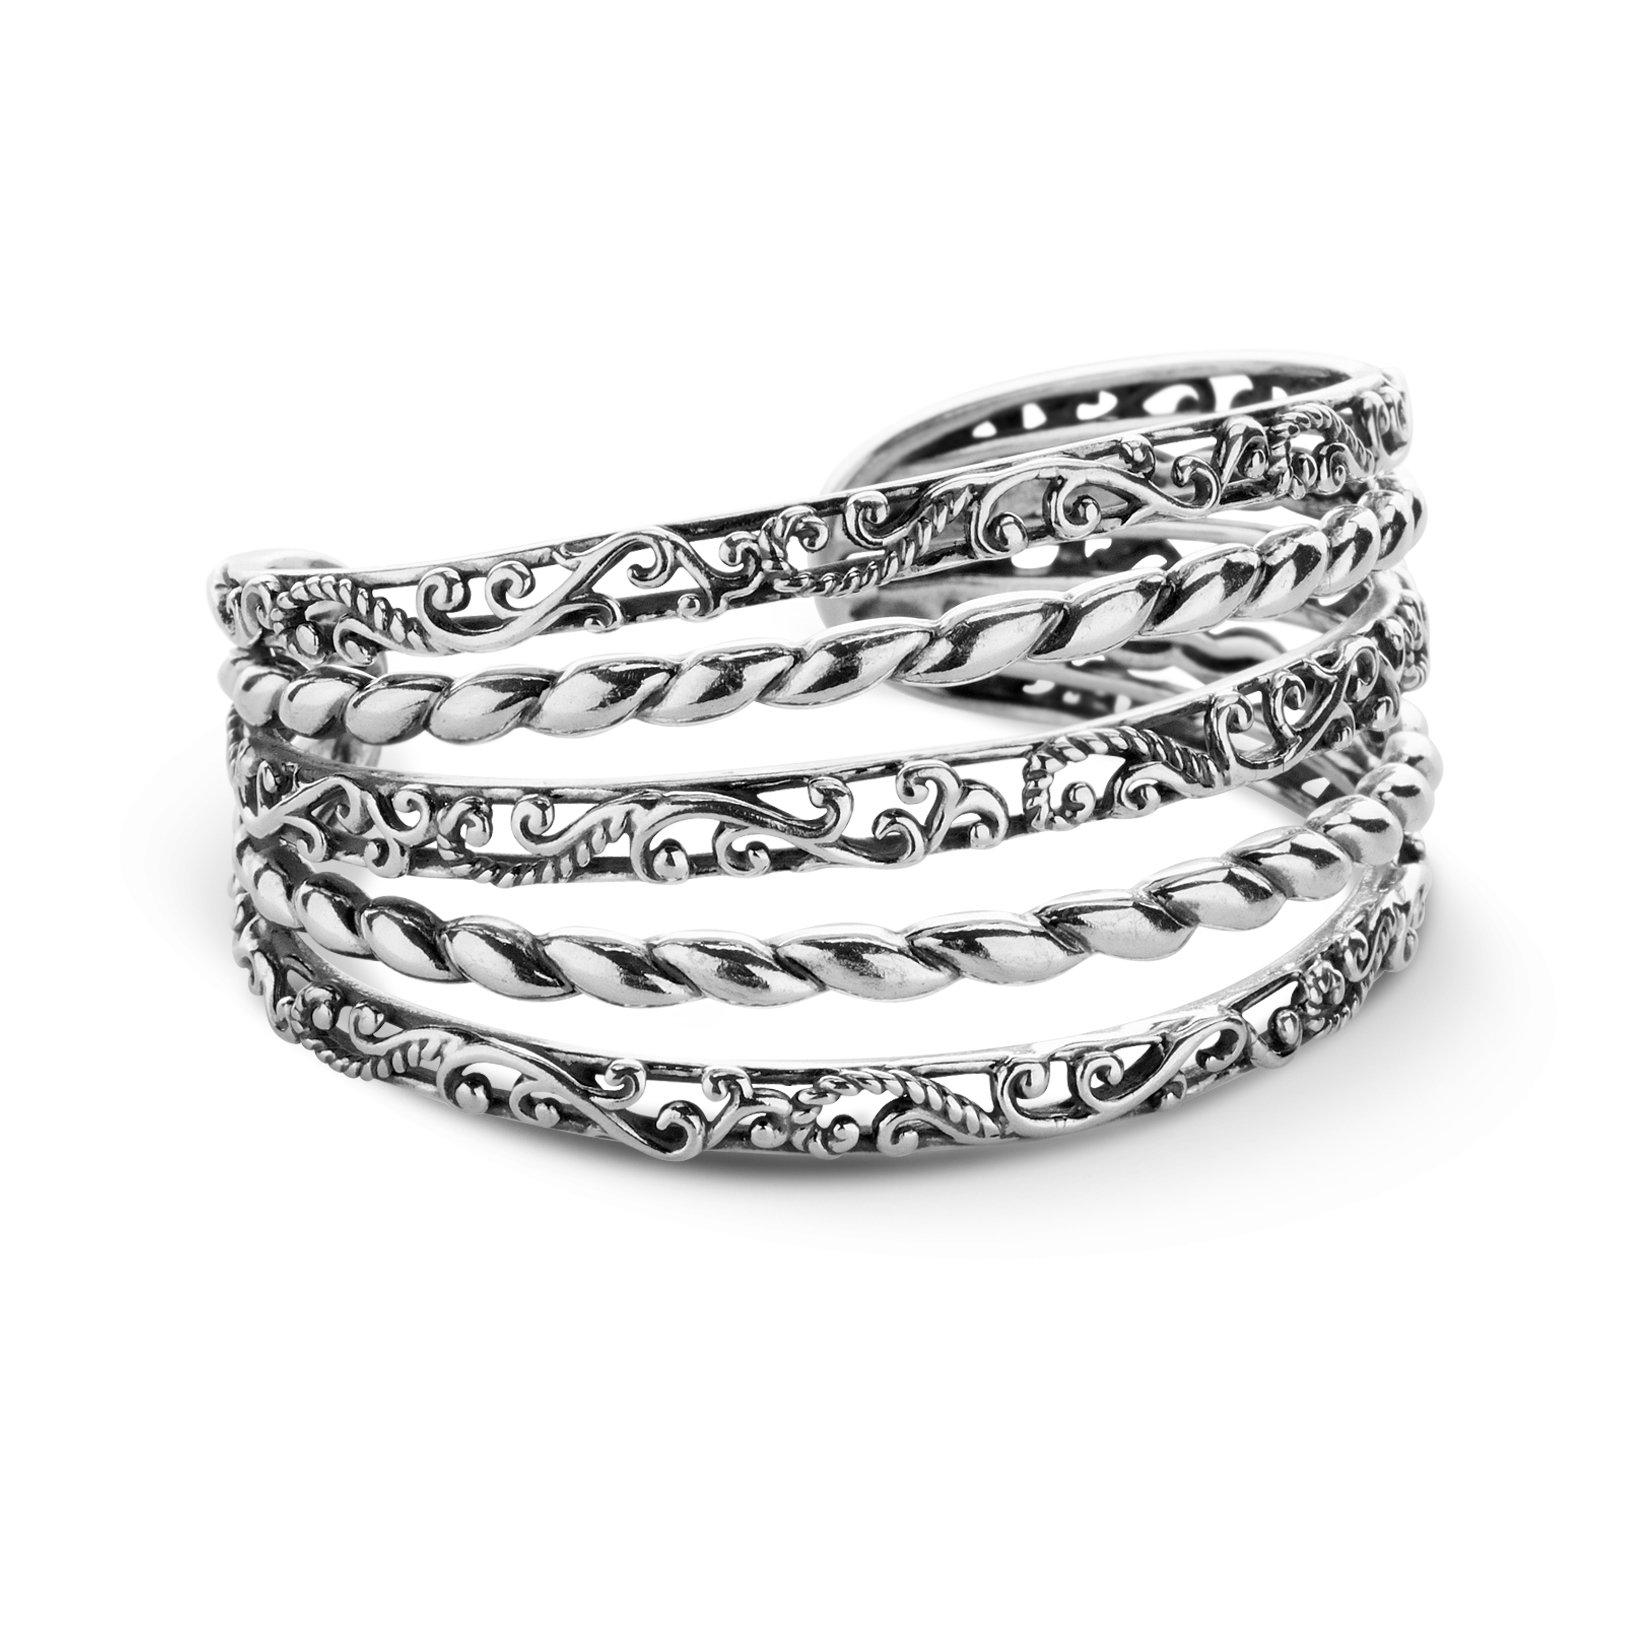 Carolyn Pollack Signature Genuine .925 Sterling Silver Five Row Cuff Bracelet